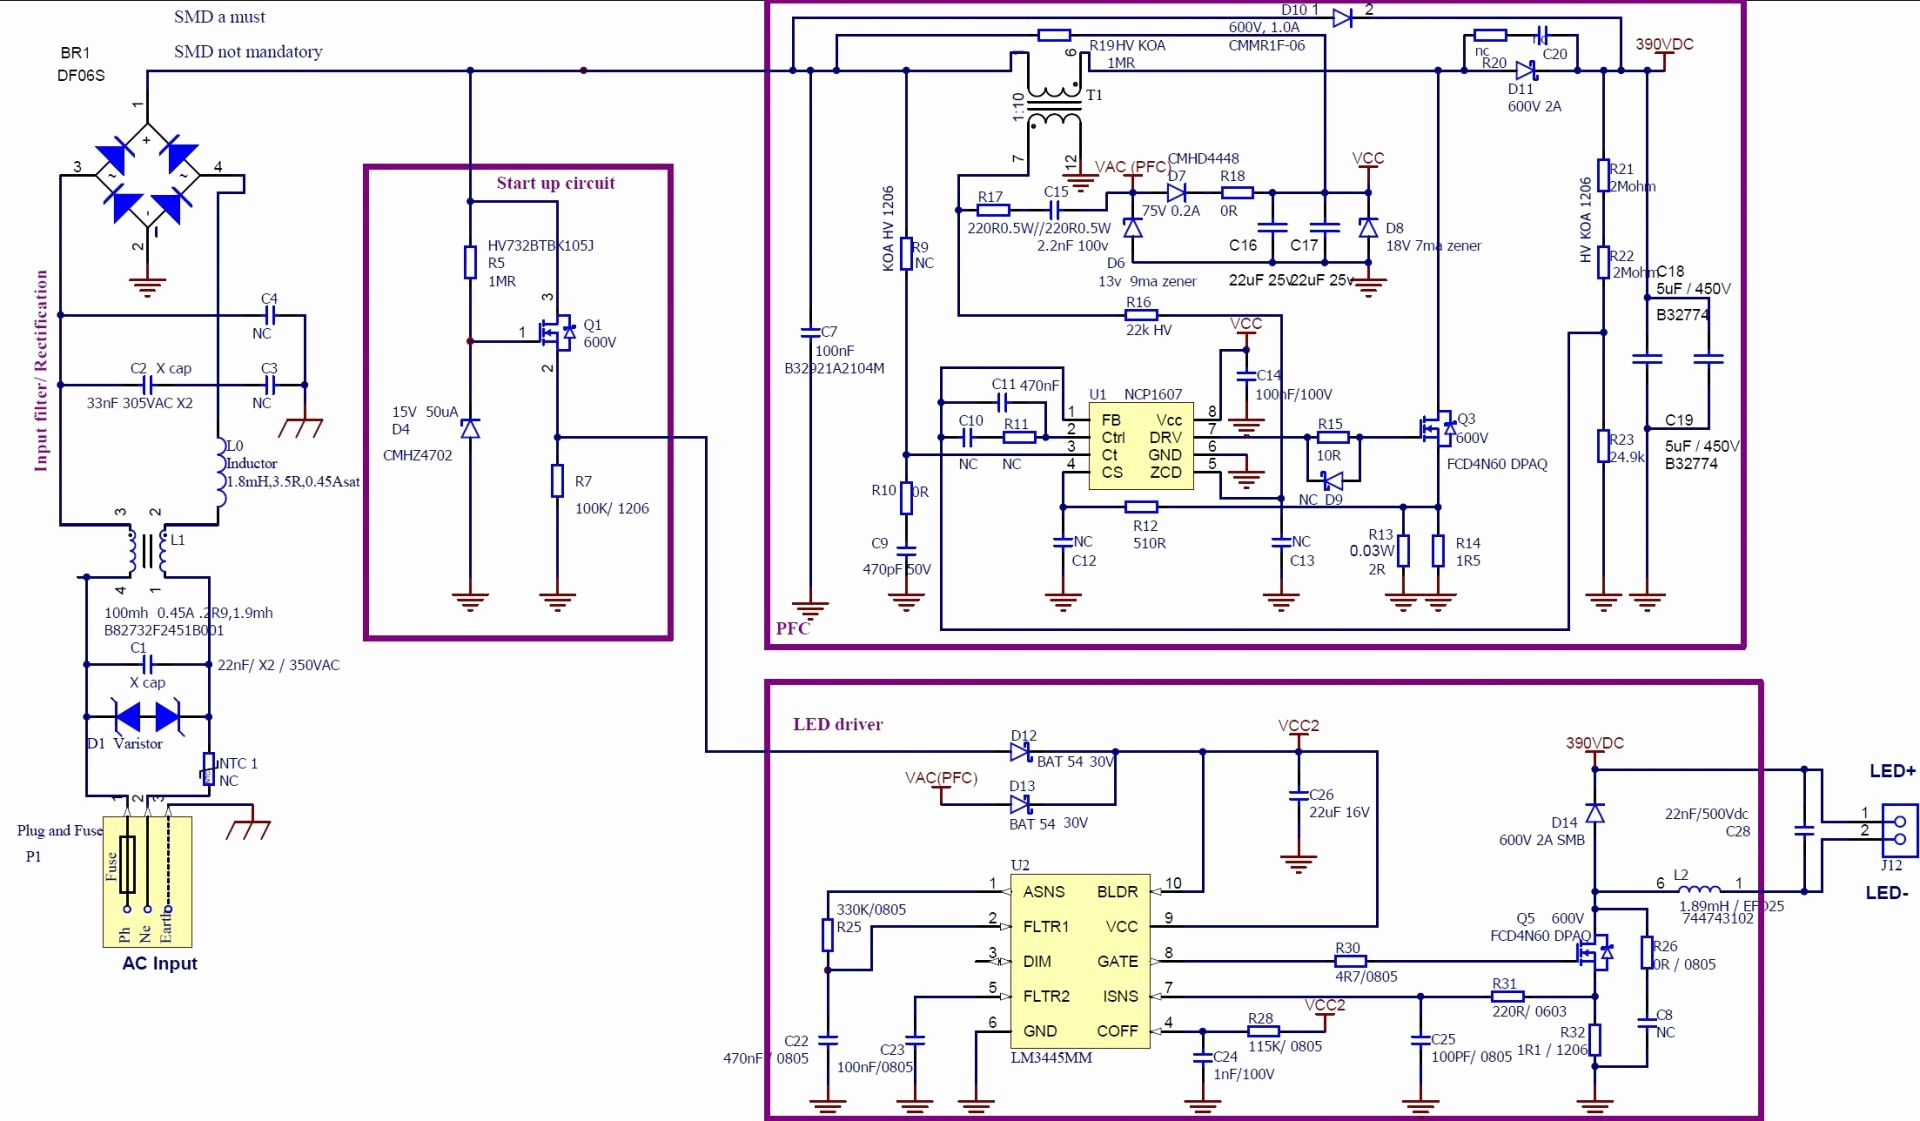 2 Lamp T8 Ballast Wiring Diagram | Wirings Diagram  Bulb Electronic Ballast Wiring Diagram on 2 bulb ballast wiring diagram, ballast replacement diagram, 4 bulb ballast wiring two, fluorescent fixtures t5 circuit diagram, 4 pin ballast wiring diagram, two lamp ballast wire diagram,